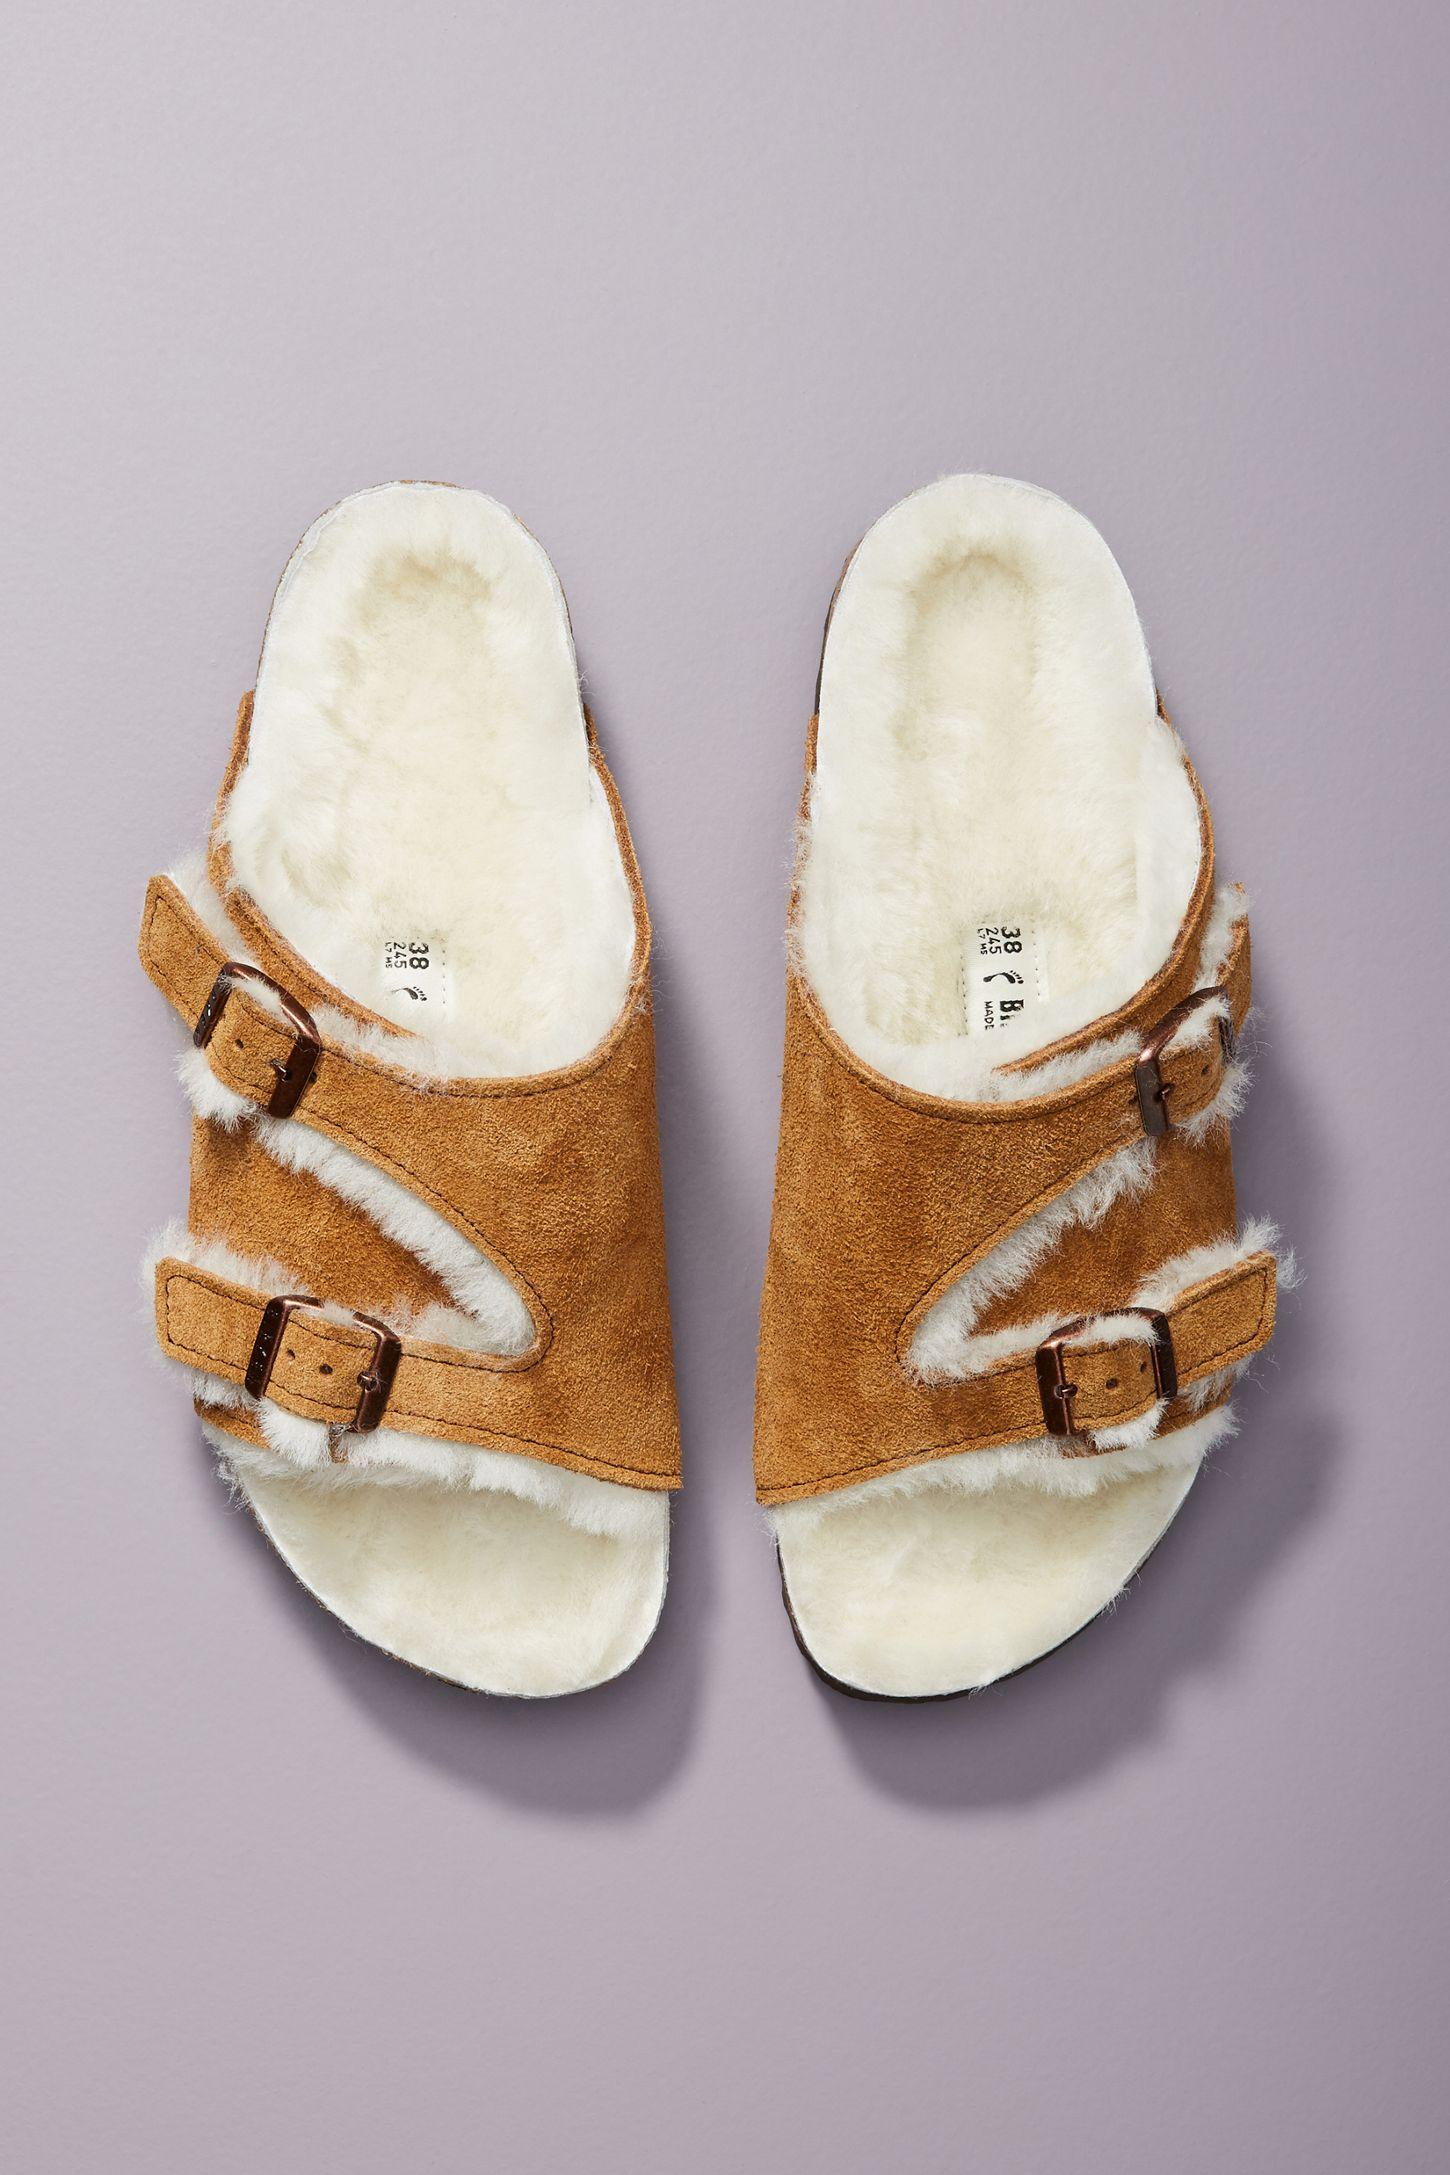 76b202614 Birkenstock Zurich Shearling Sandals